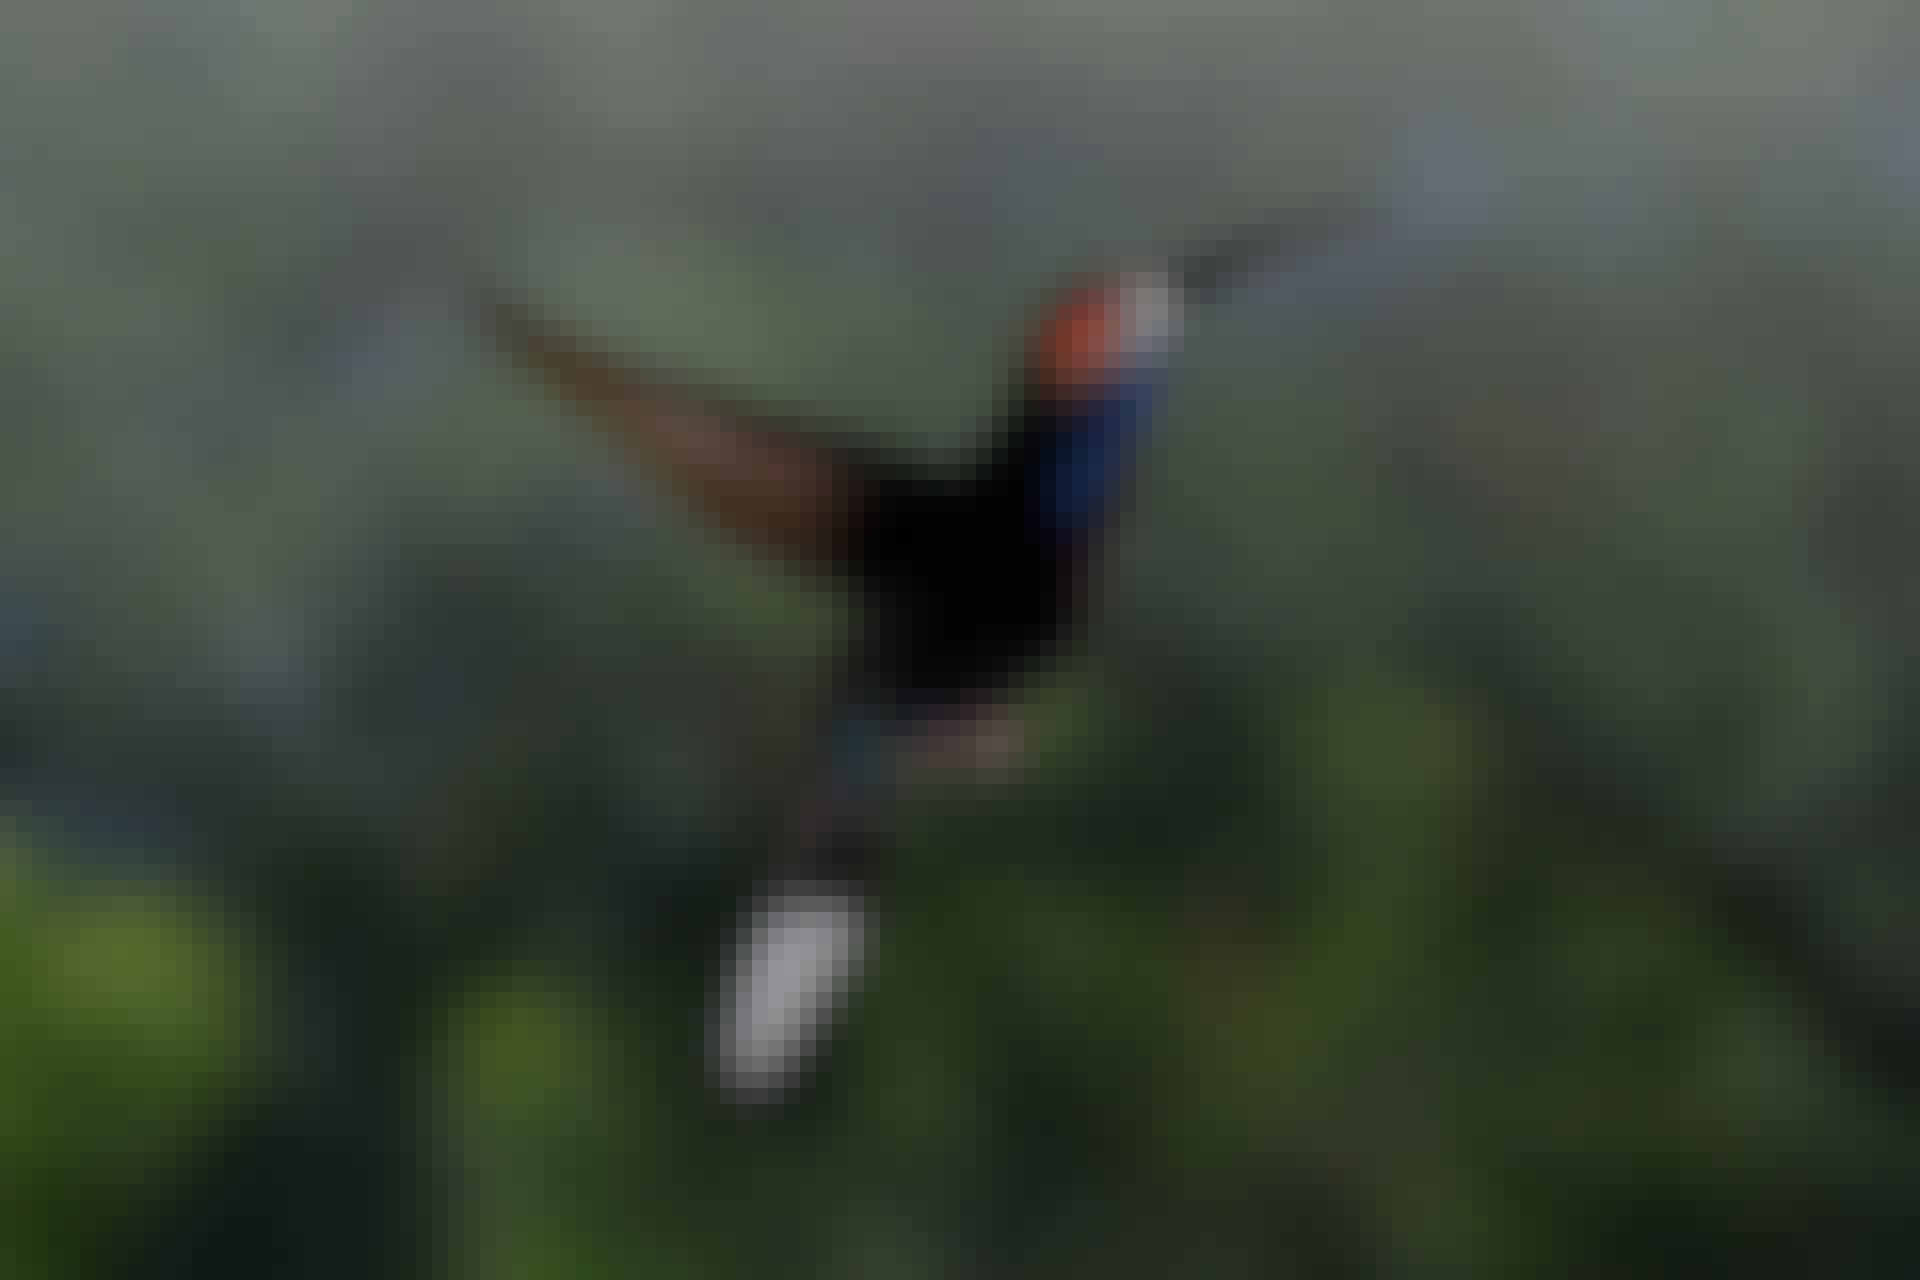 Kolibrins hjärna